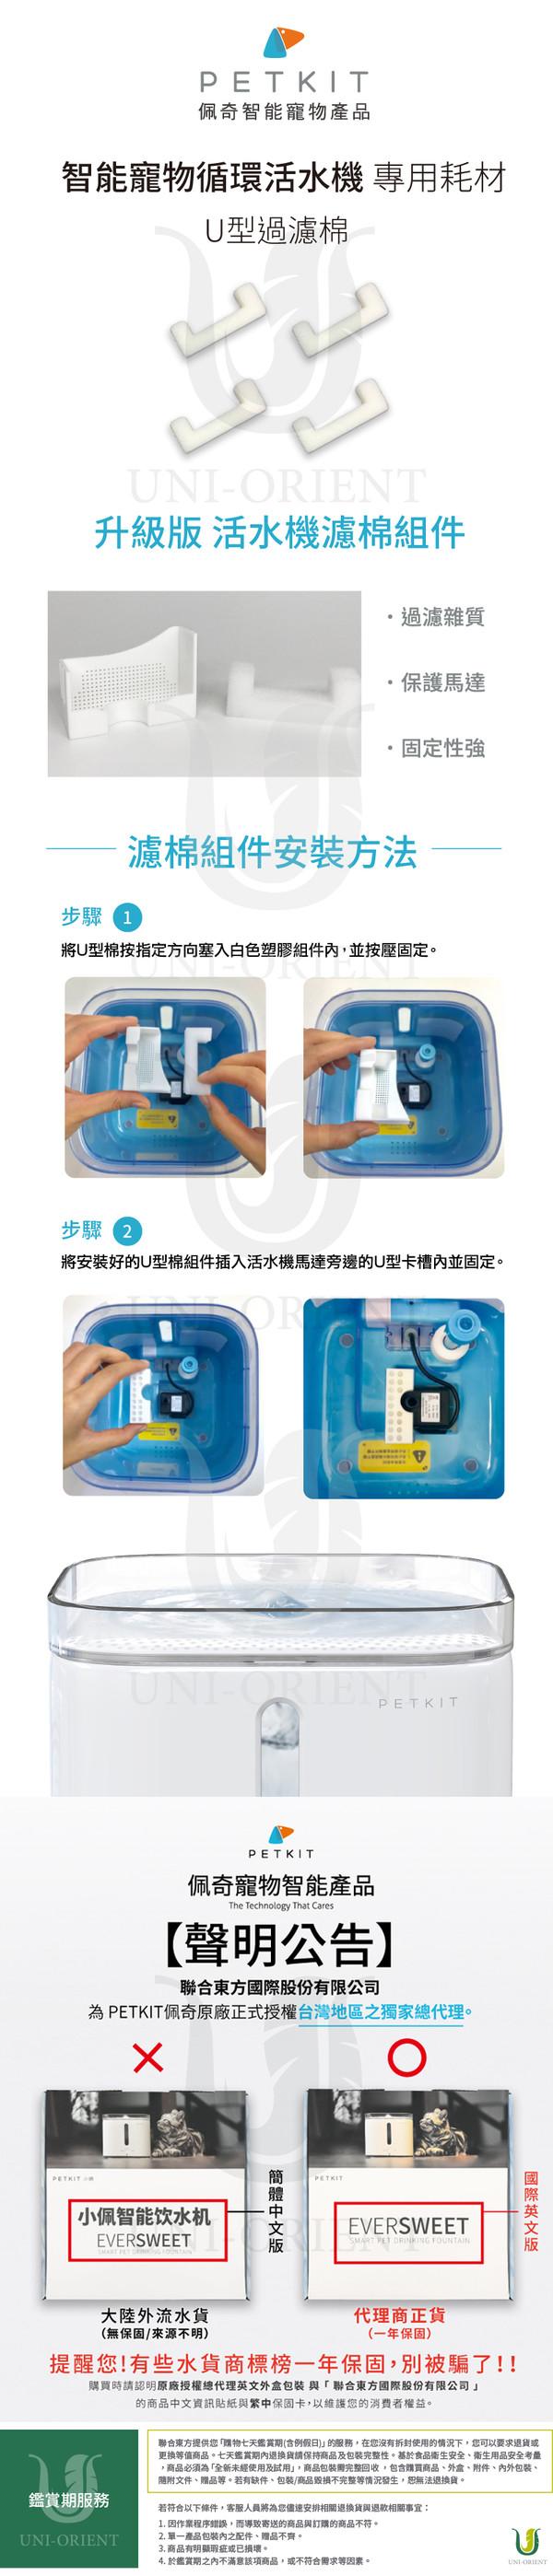 1148088000Petkit佩奇智能寵物循環活水機U型過濾棉四入裝